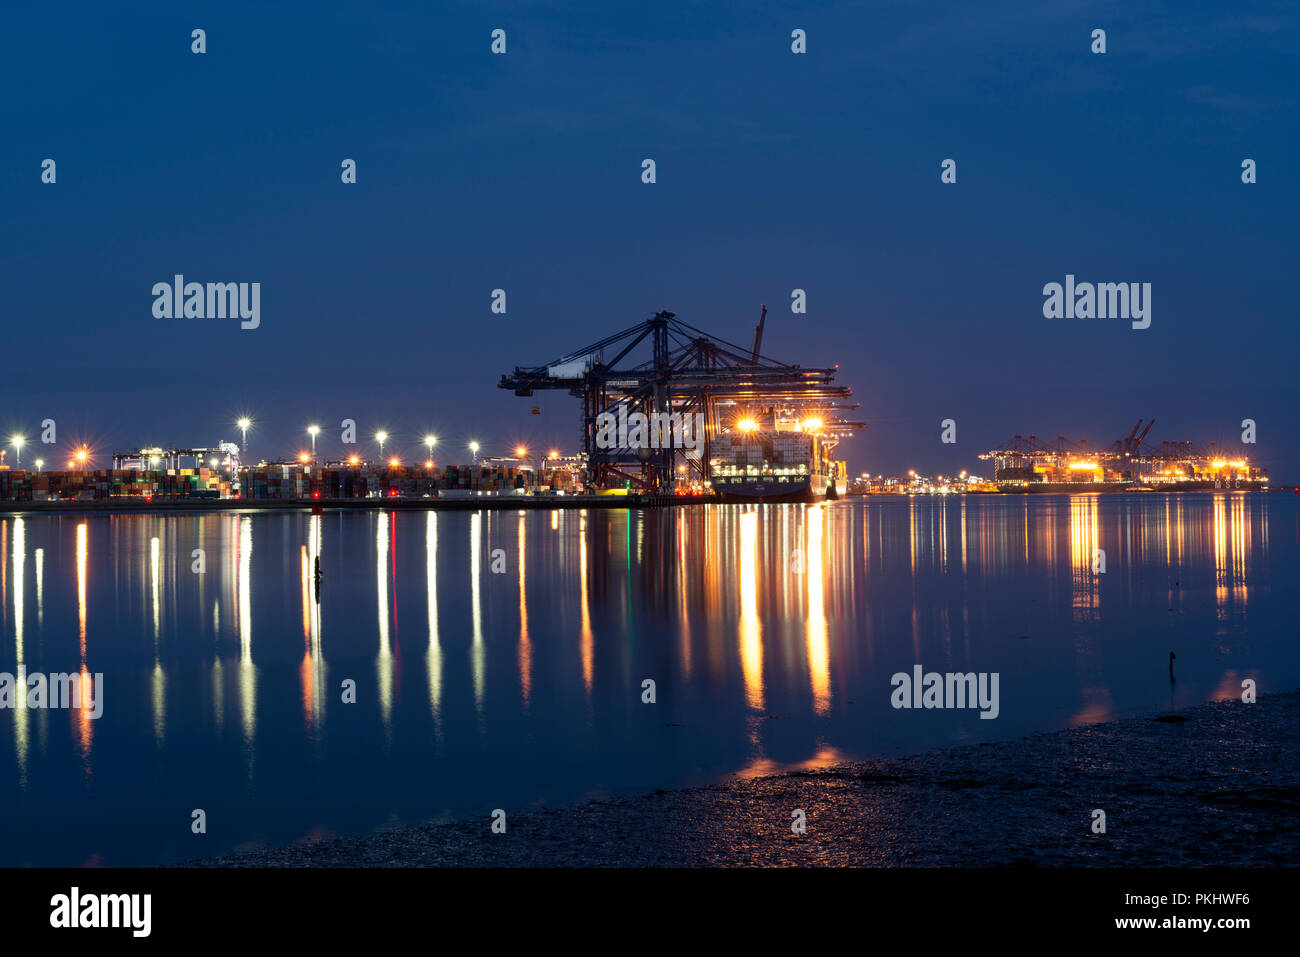 Port of Felixstowe at night, Suffolk, UK. - Stock Image